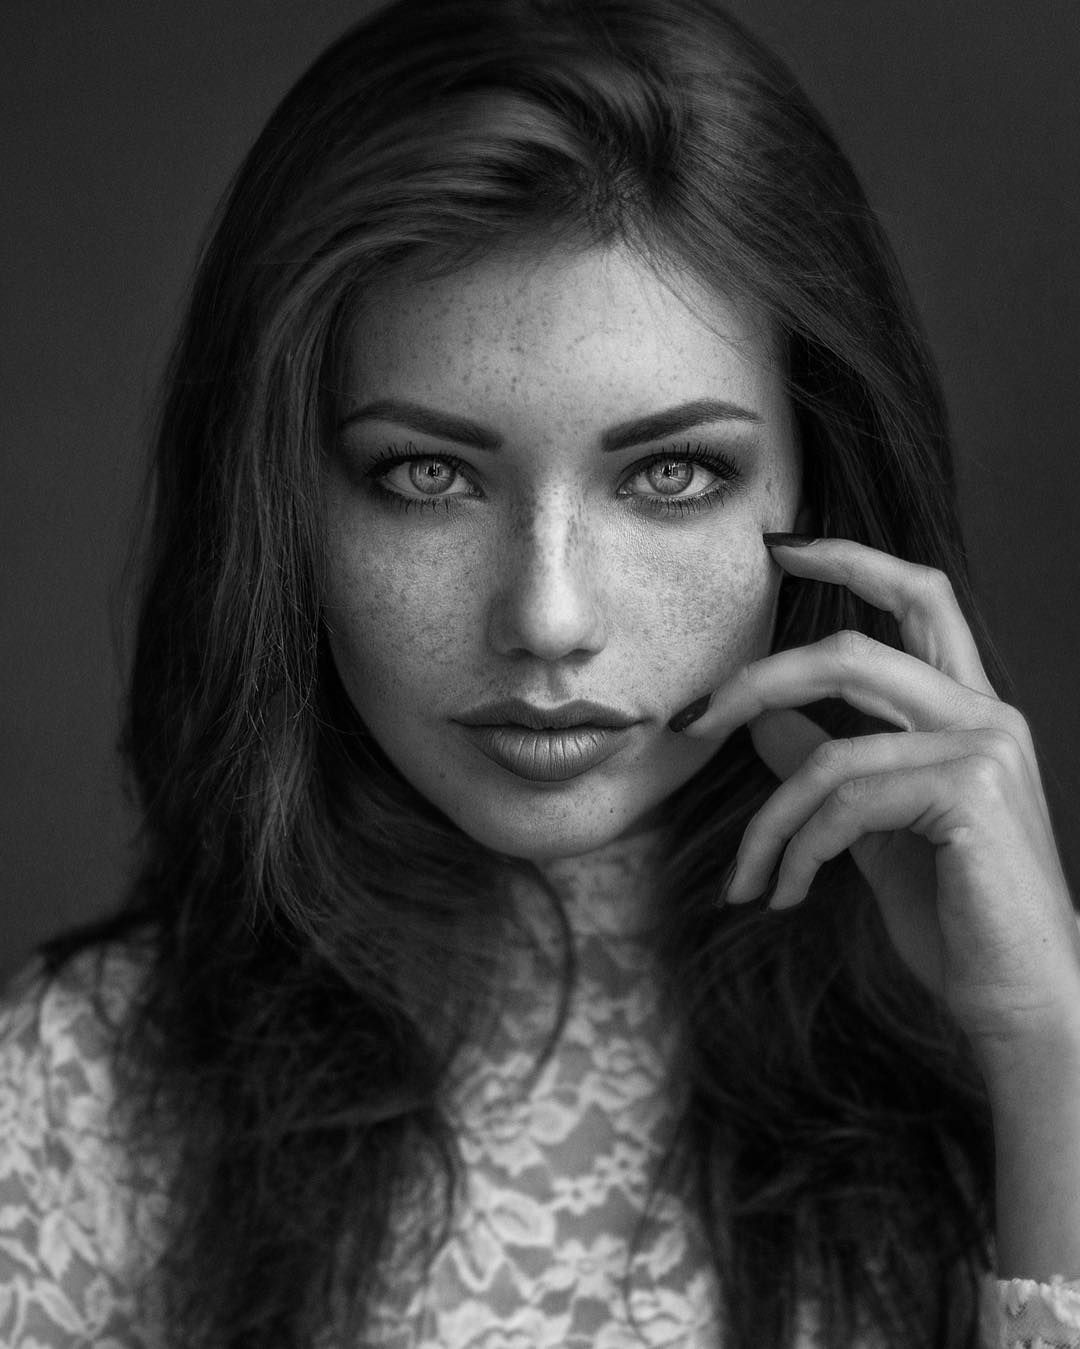 Model Svetlana Grabenko (@lana__sweet